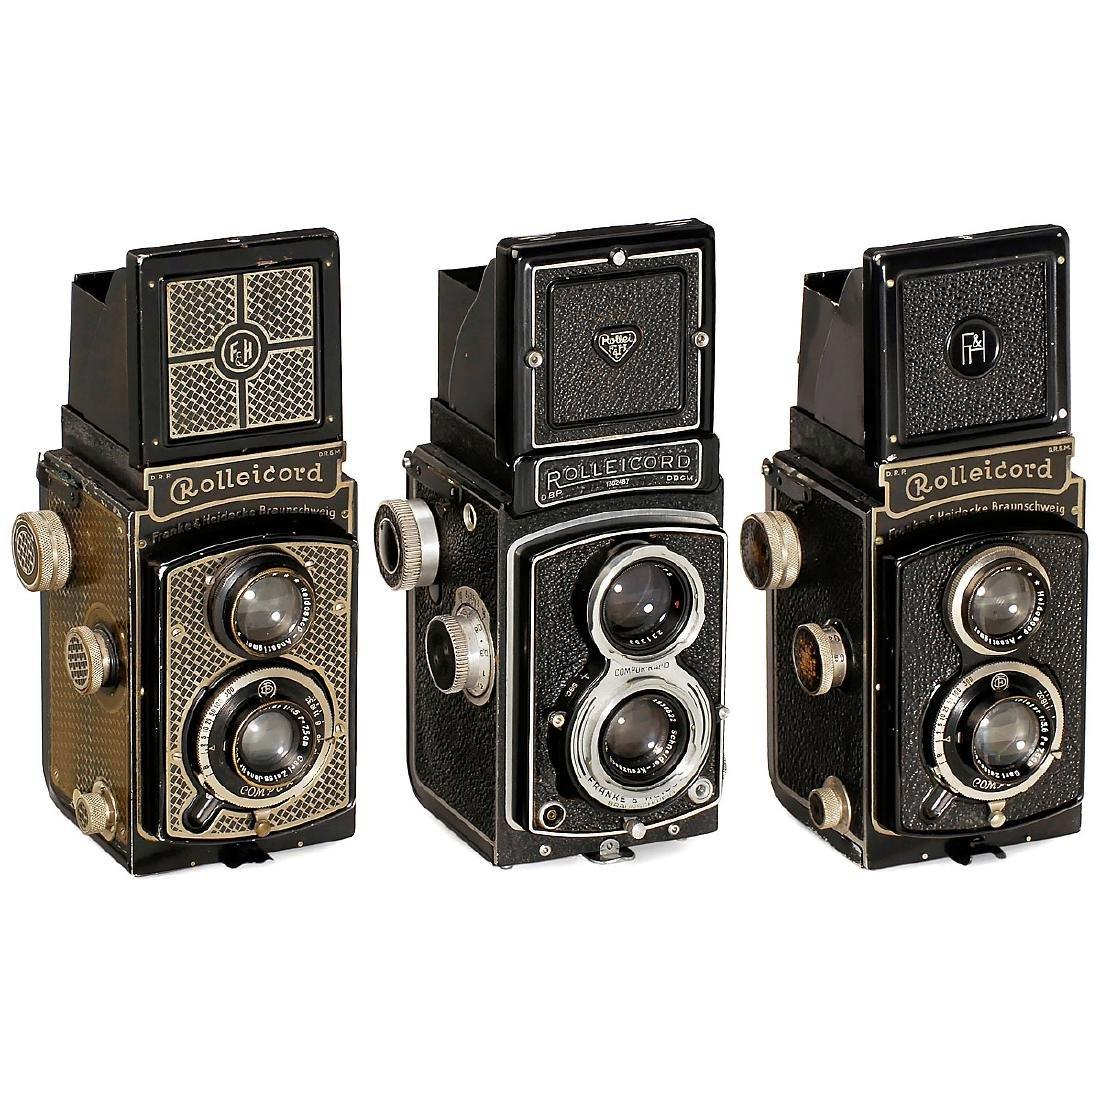 3 Rolleicord Cameras